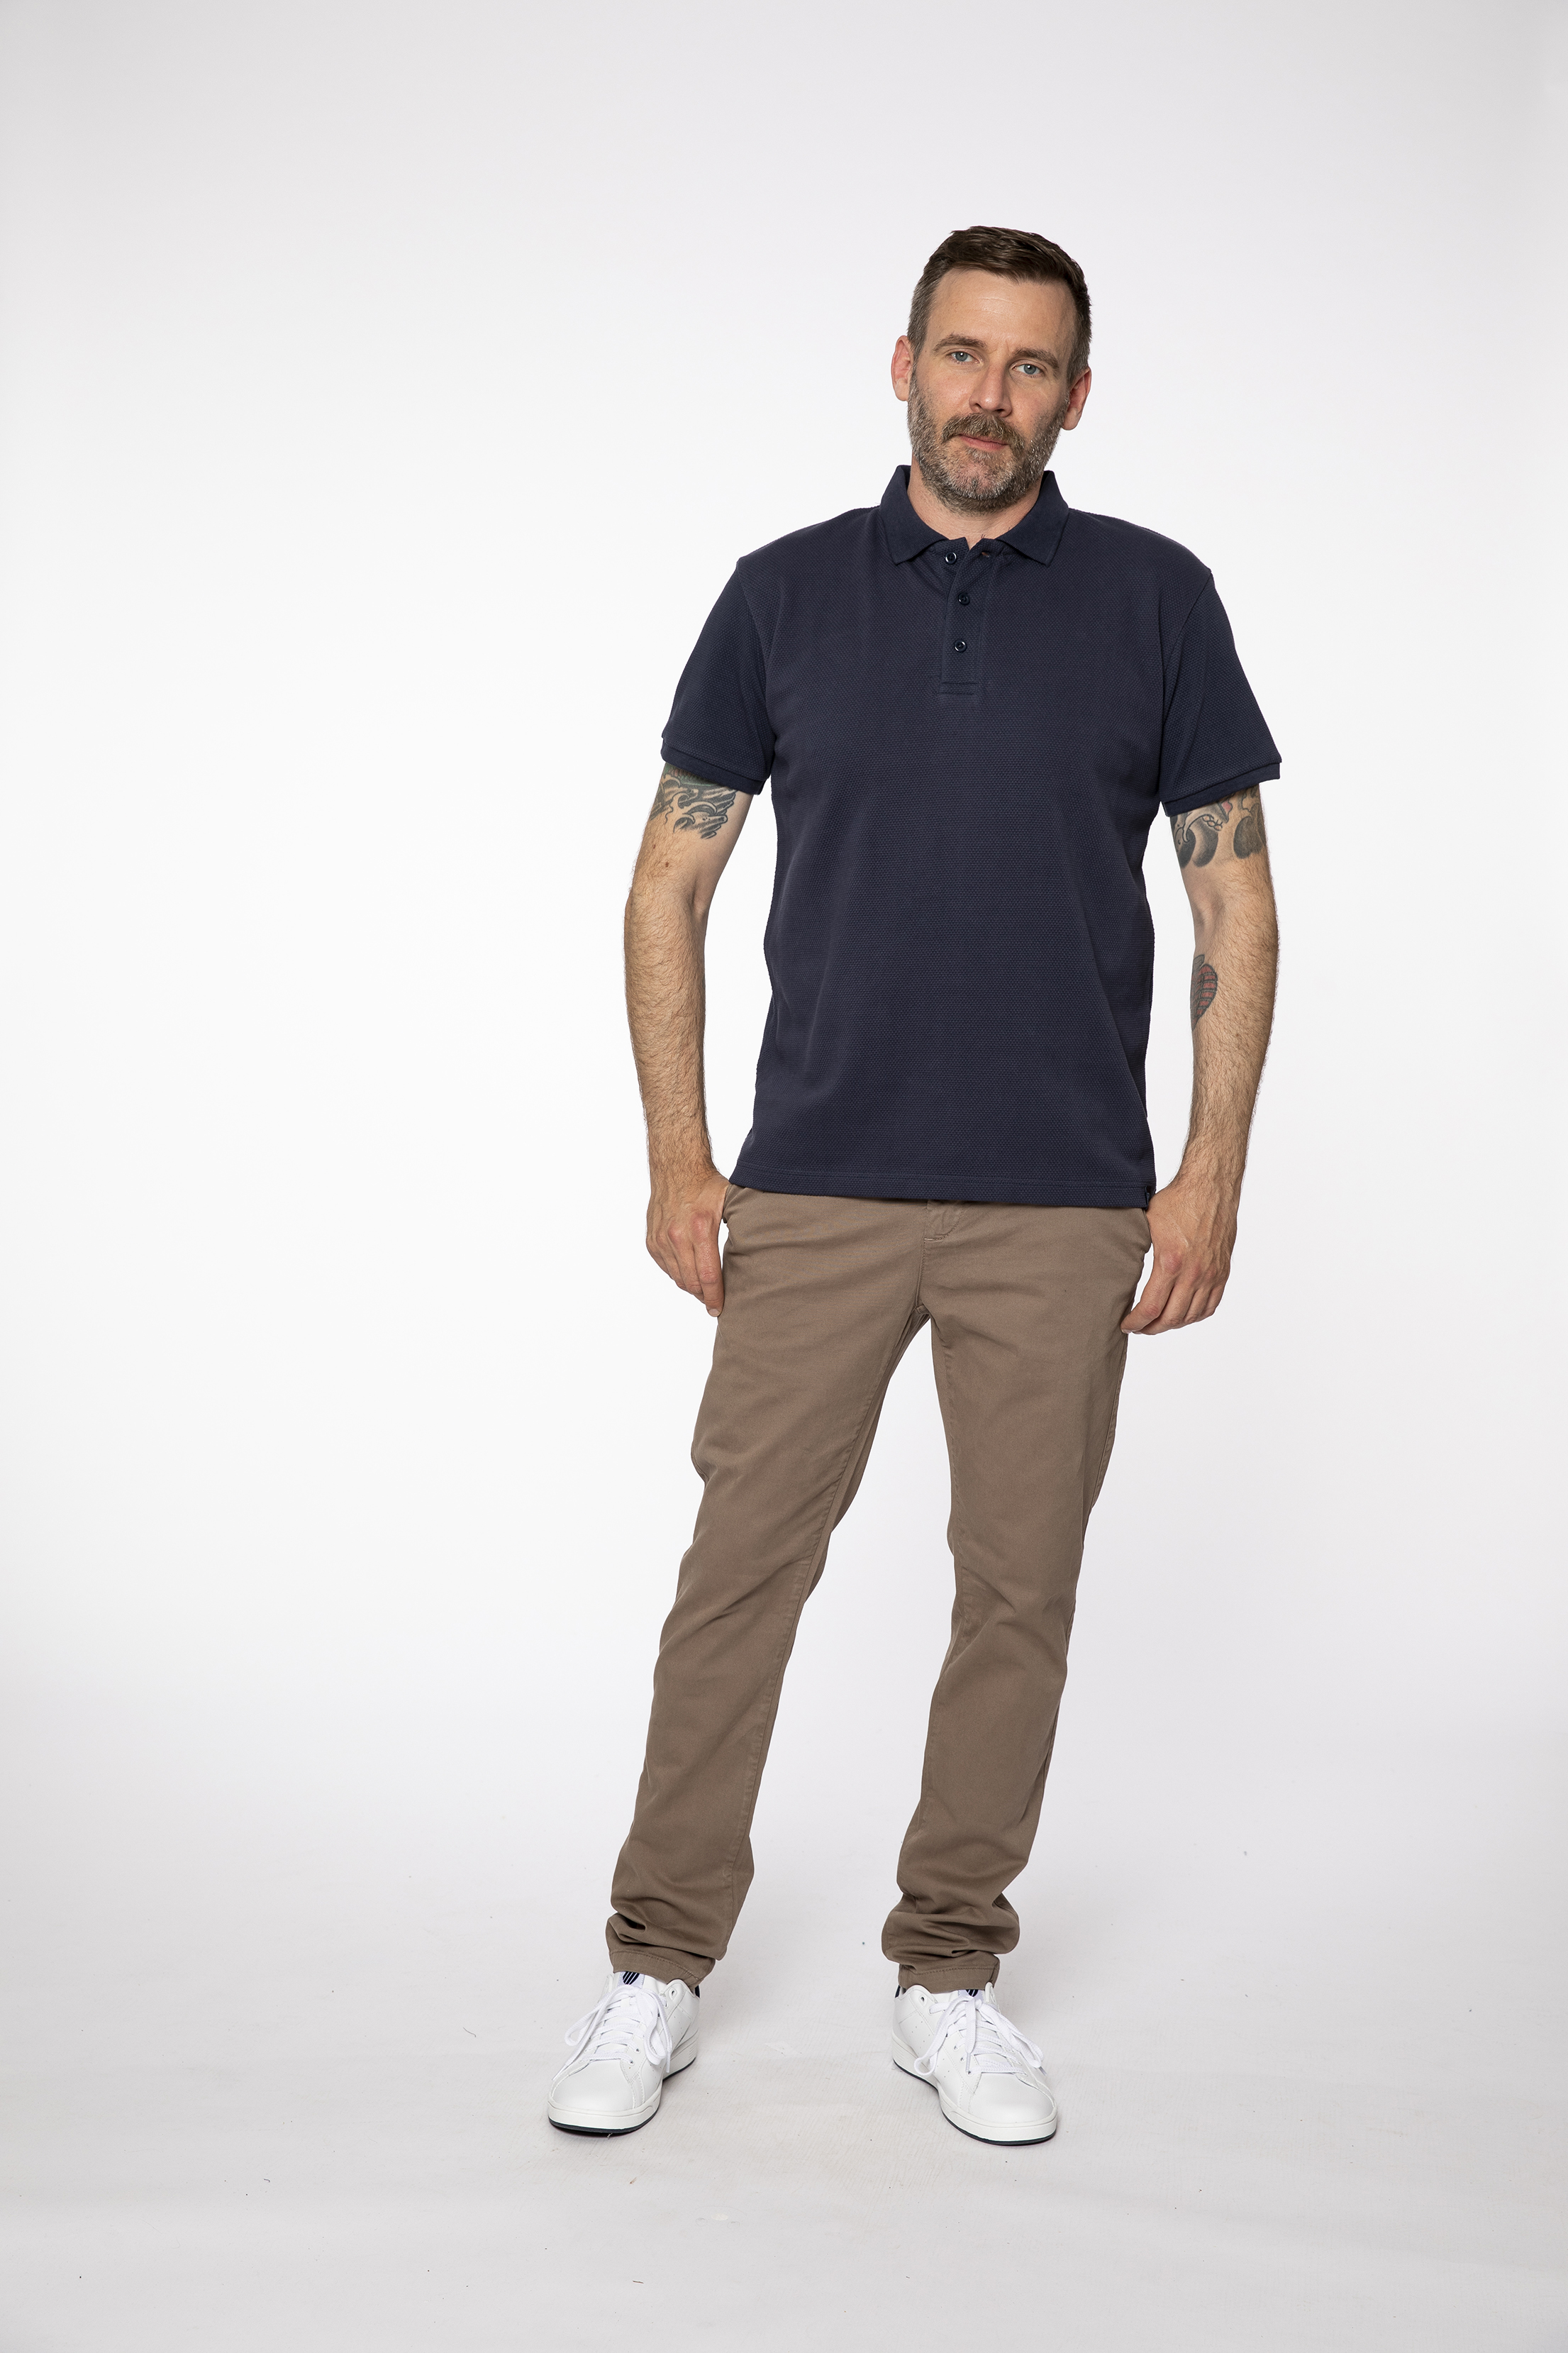 polo shirt:  DAILYNEWS   chino pants:  INTHEMOOD